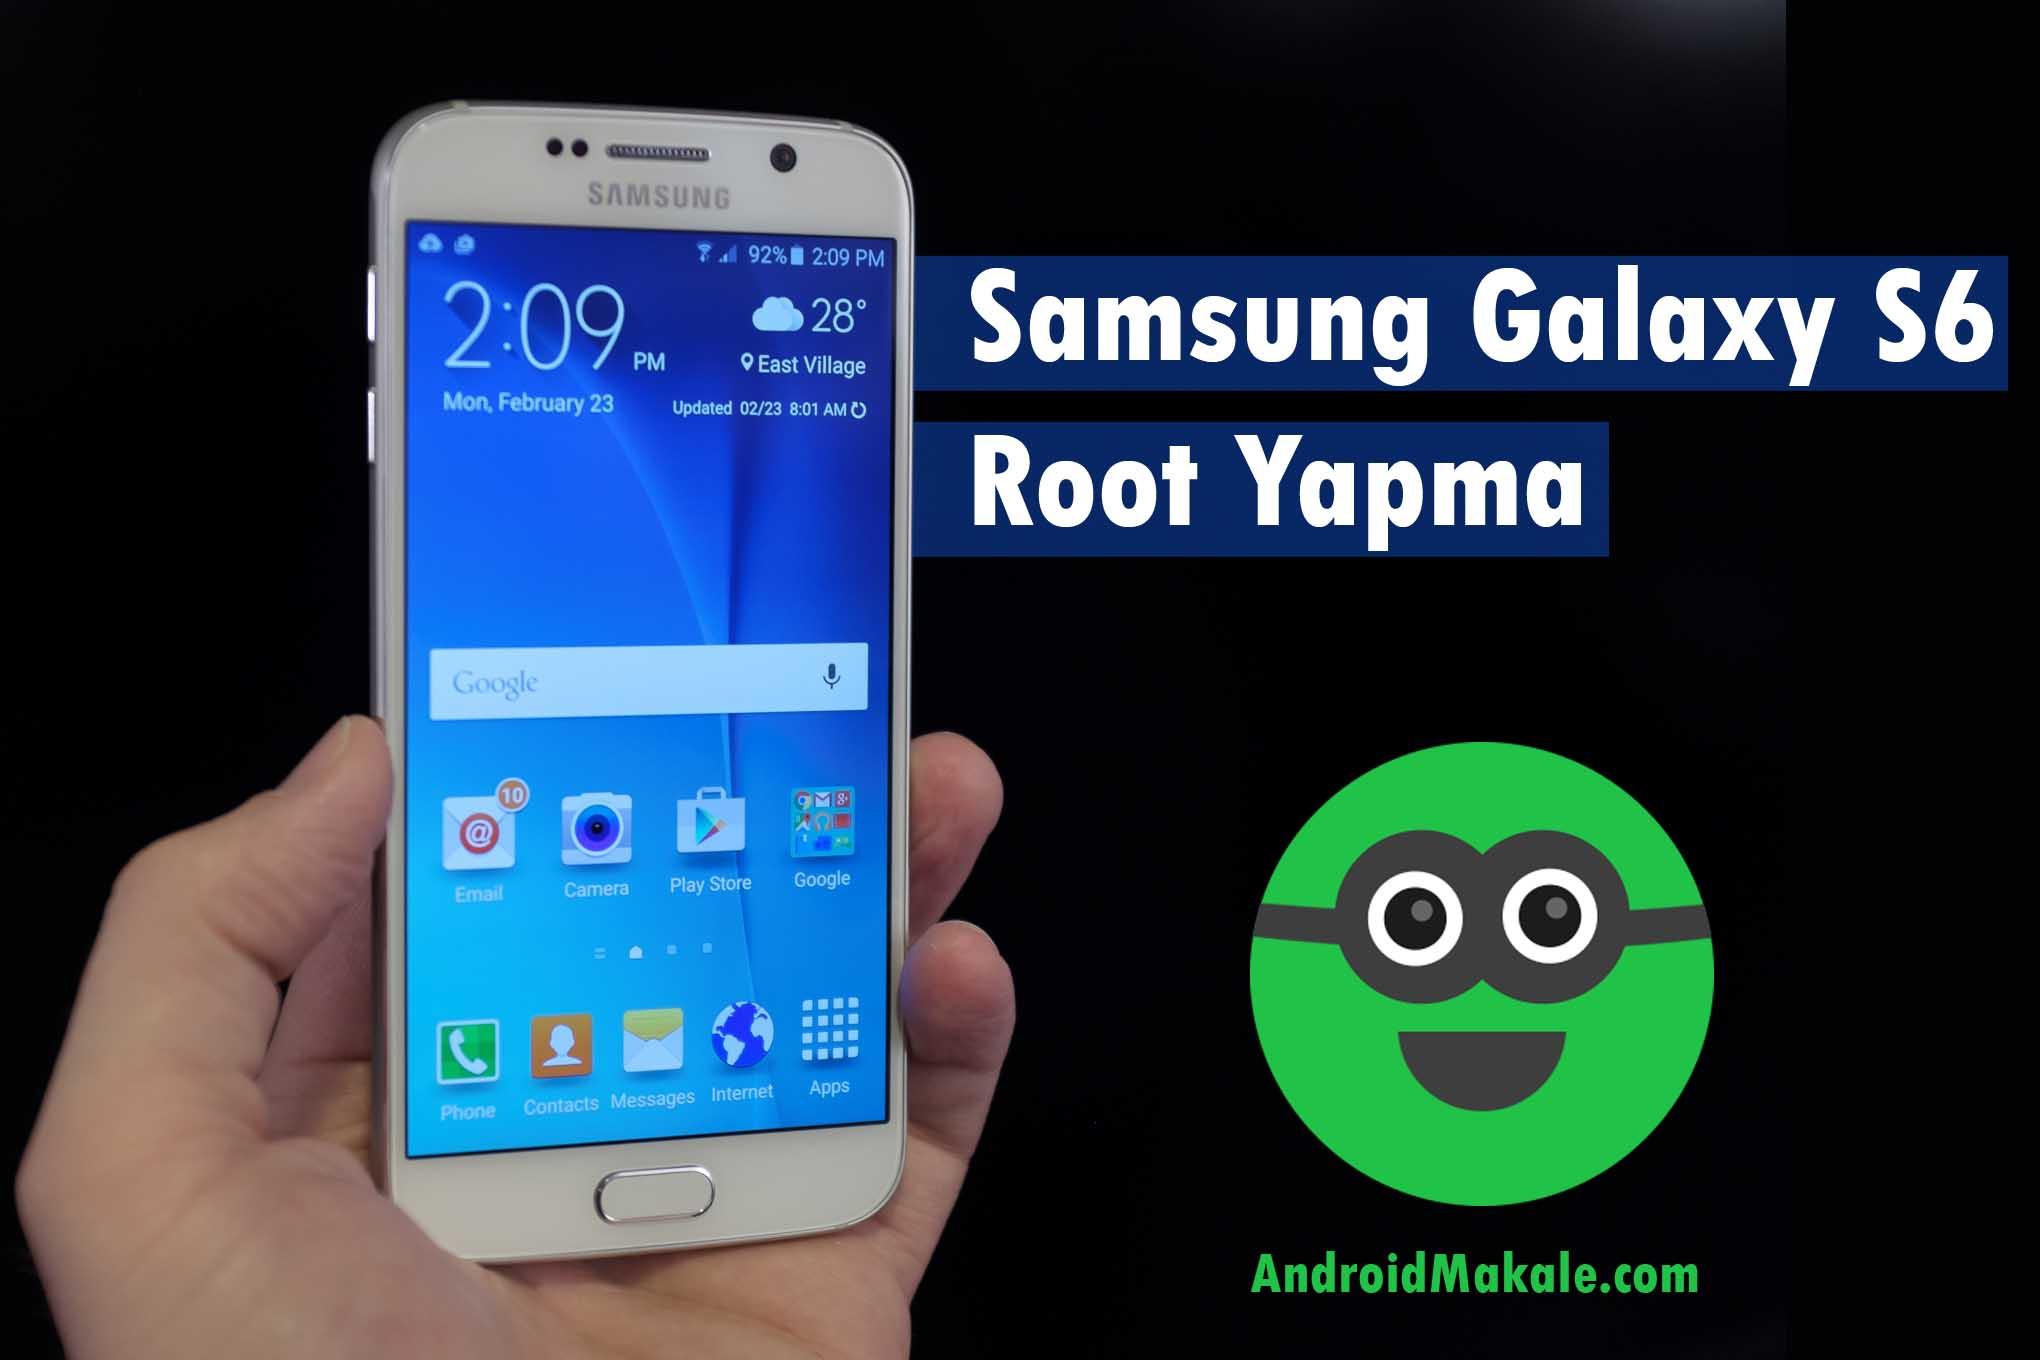 Samsung Galaxy S6 Root Yapma Rehberi Resimli samsung s6 root yapma resimli samsung root yapma samsung Galaxy S6 root yapma rehberi s6 root yapma etme Galaxy S6 root yapma galaxy root yapma androidmakale